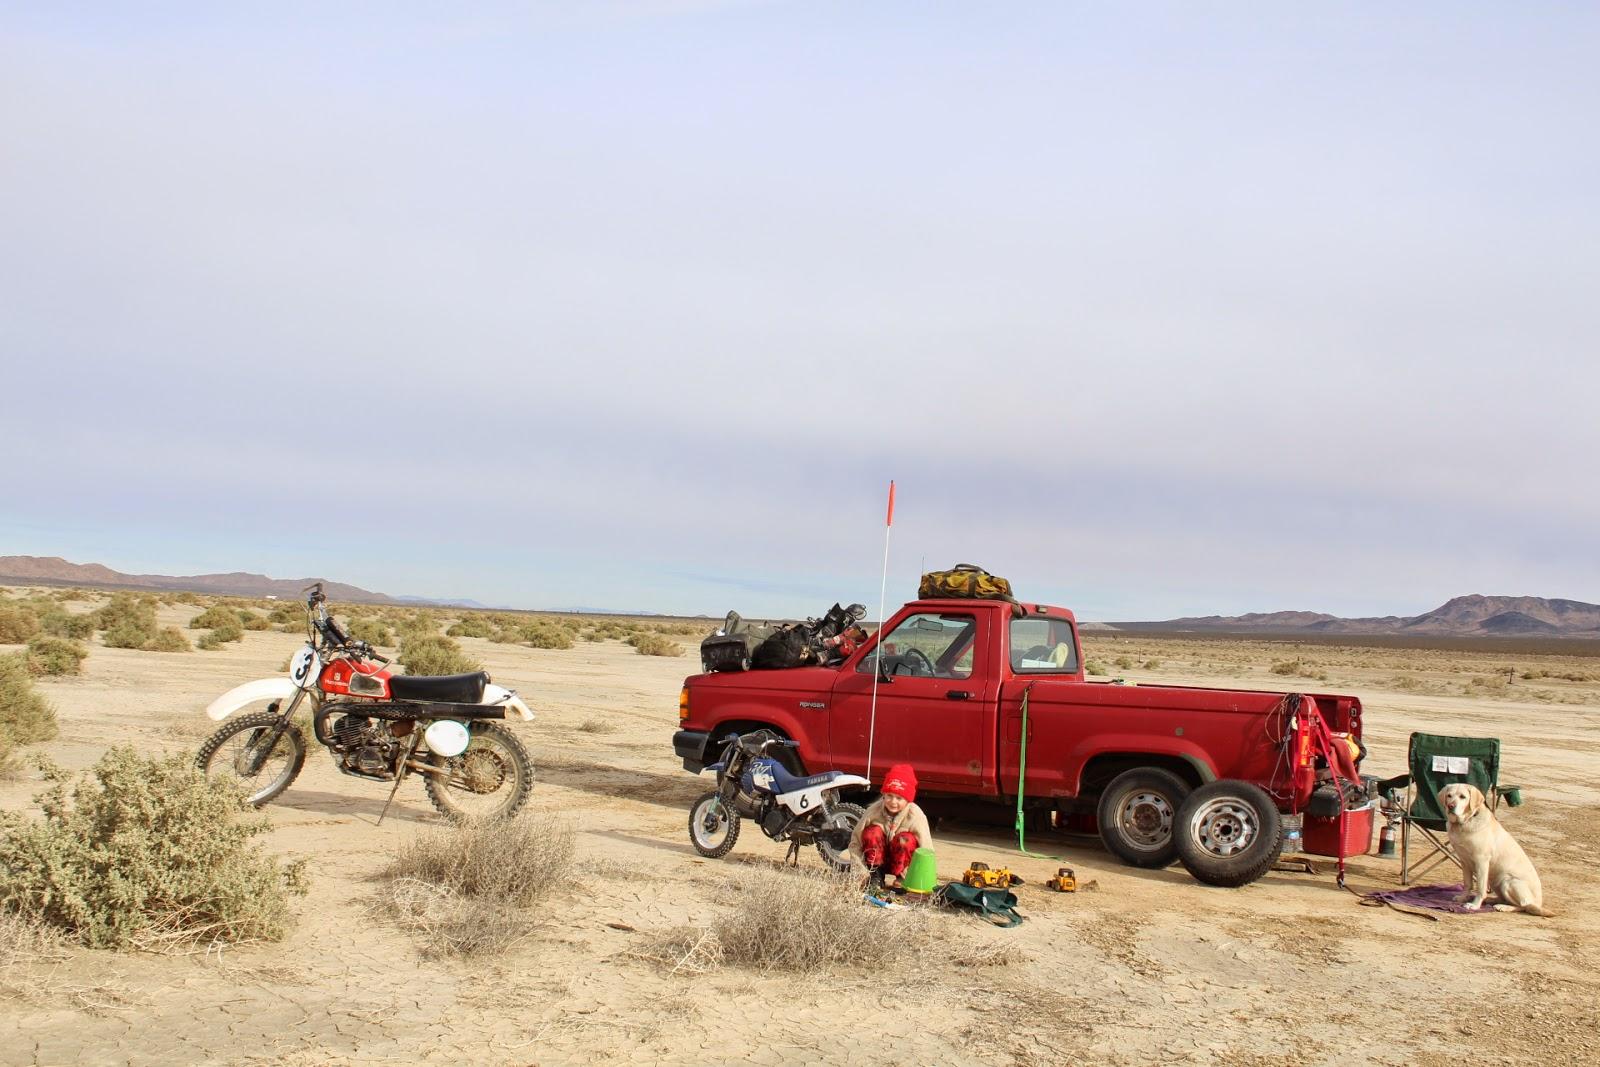 el mirage dry lake bed racing - photo #4